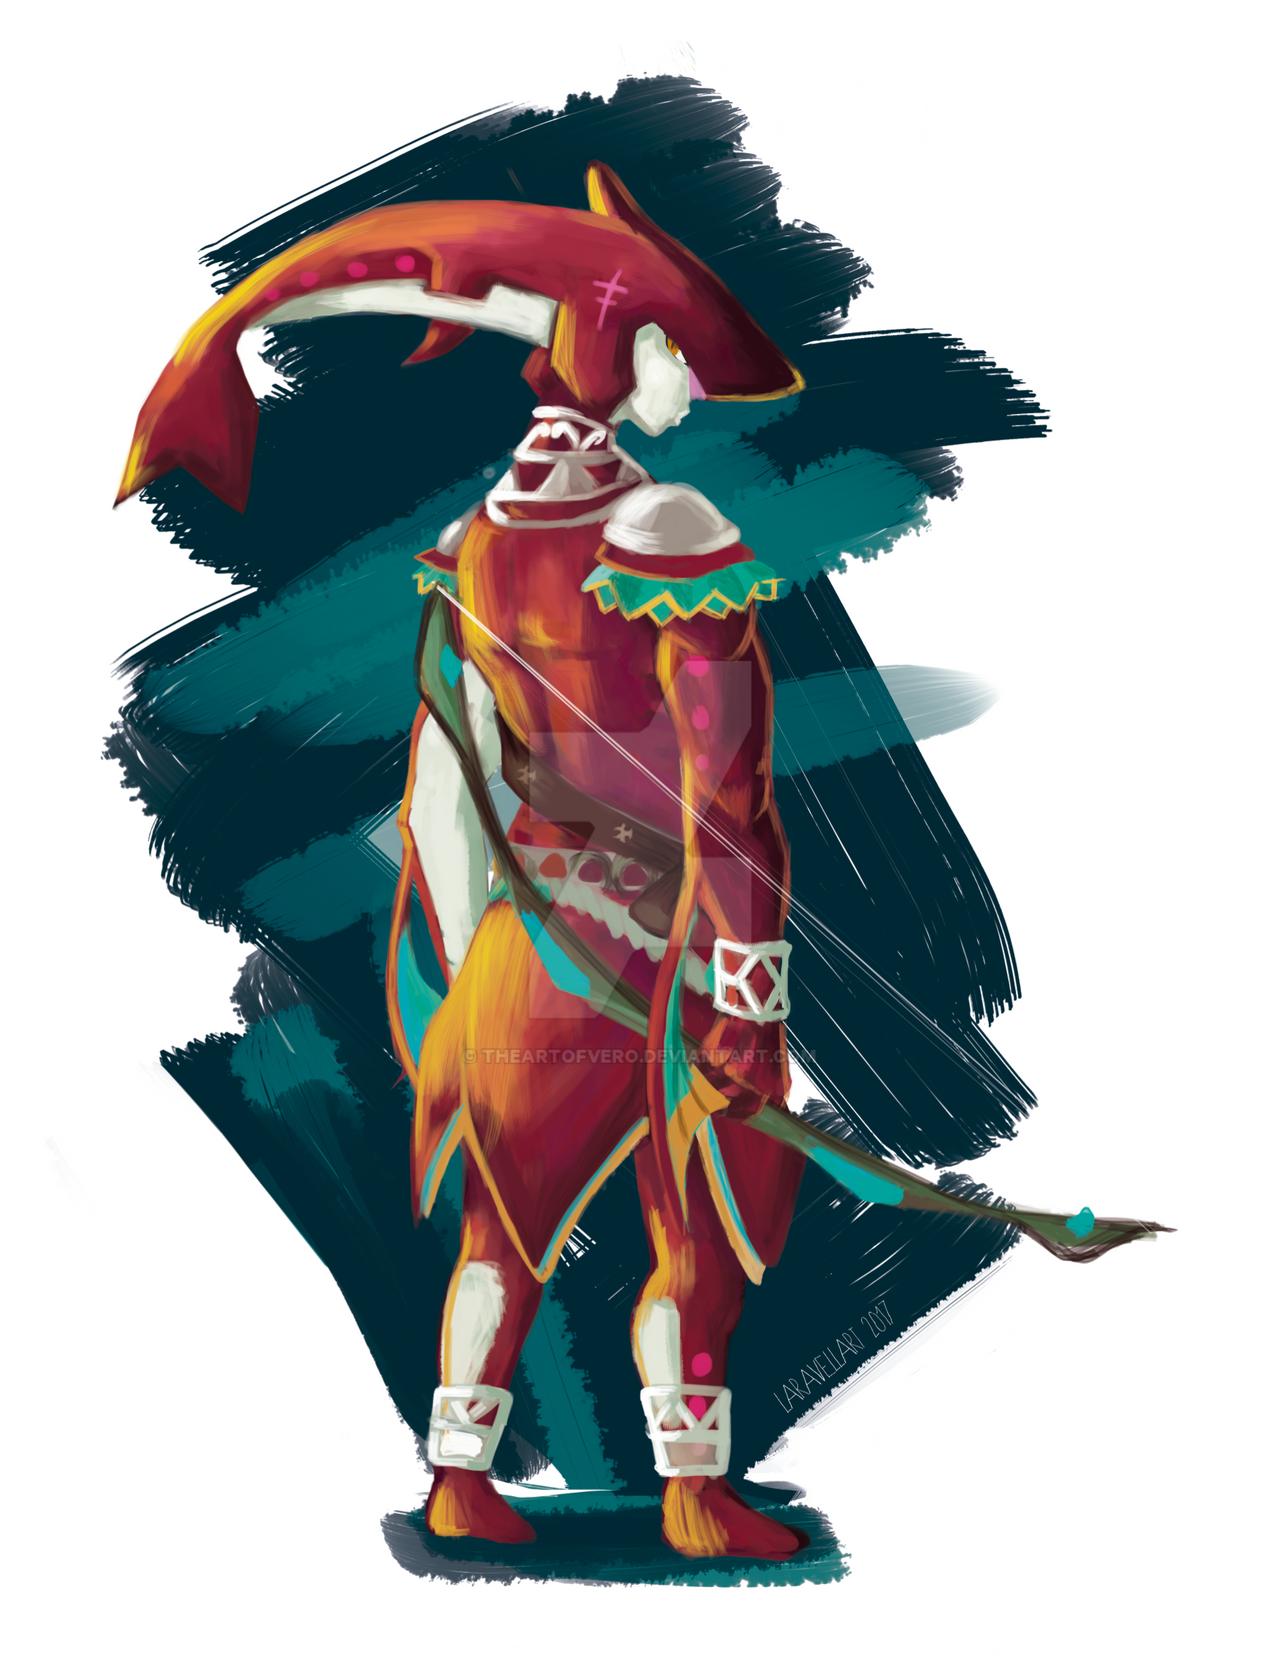 Zelda Character Design Breath Of The Wild : The legend of zelda breath wild sidon by